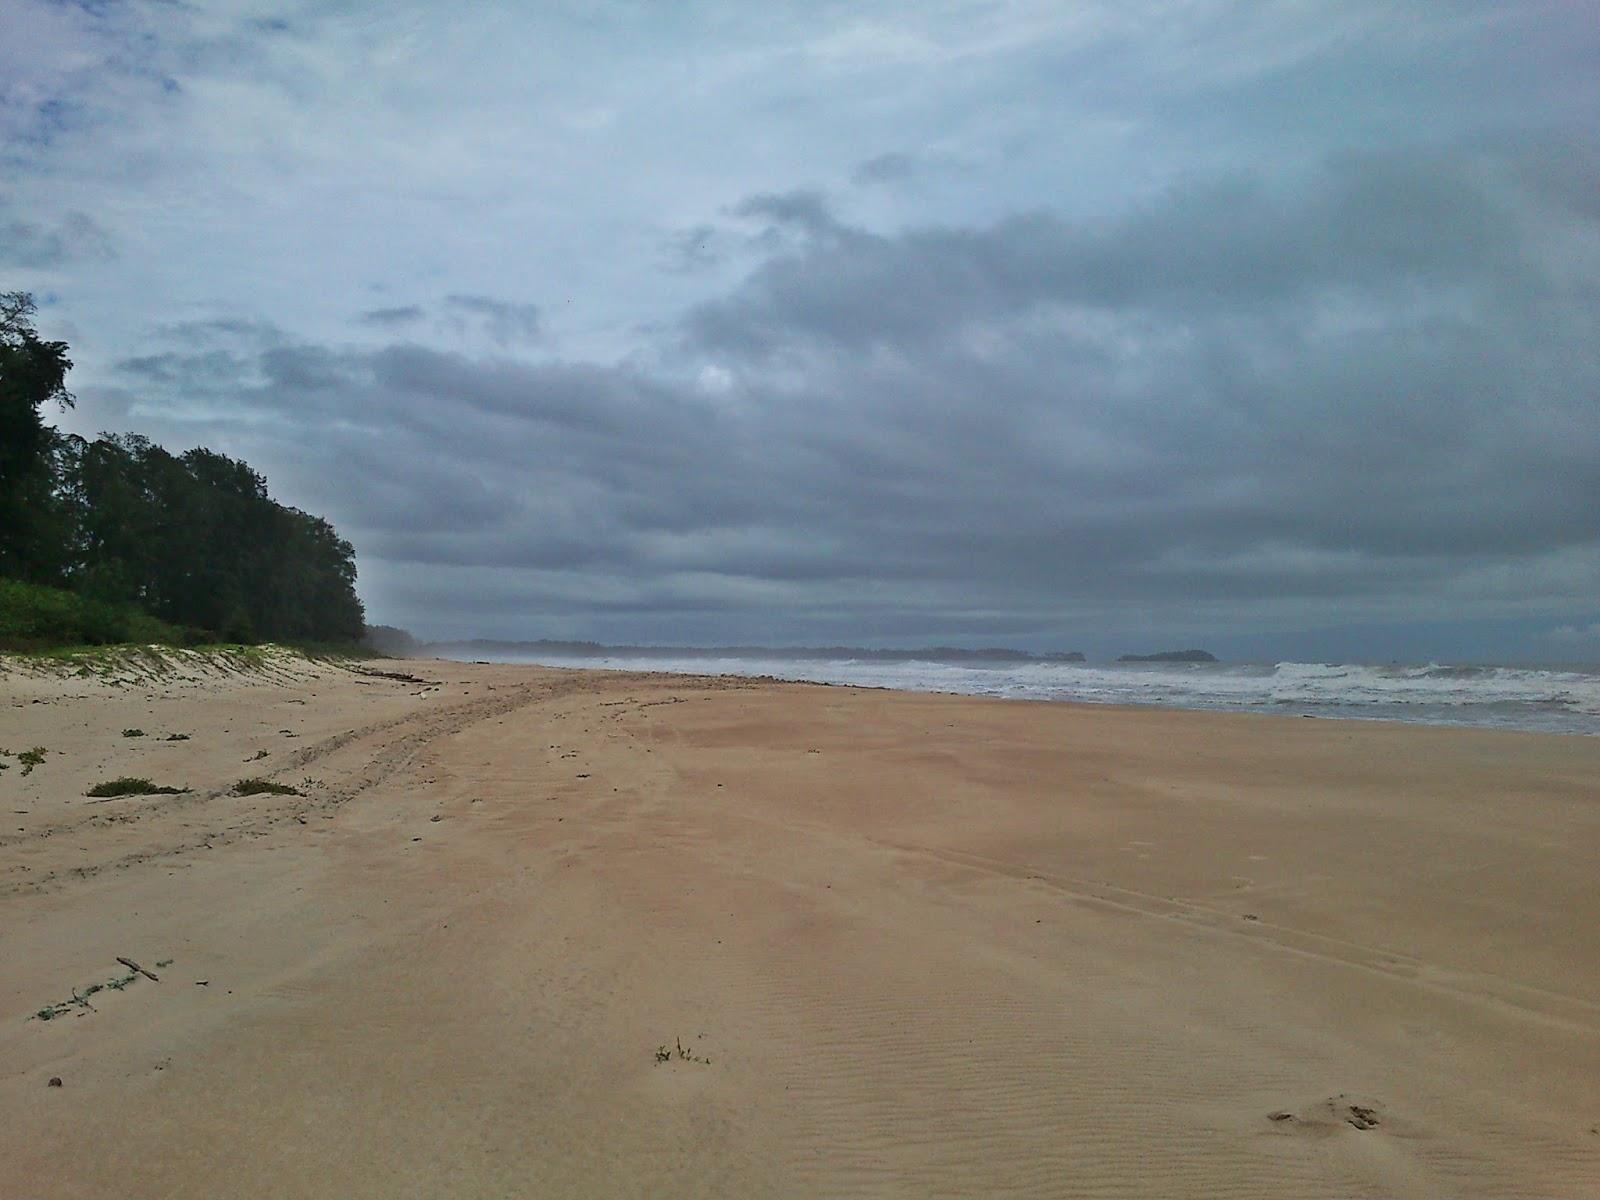 NIfISH tRAVELOGUES: Aravali Beach (Sindhudurg)